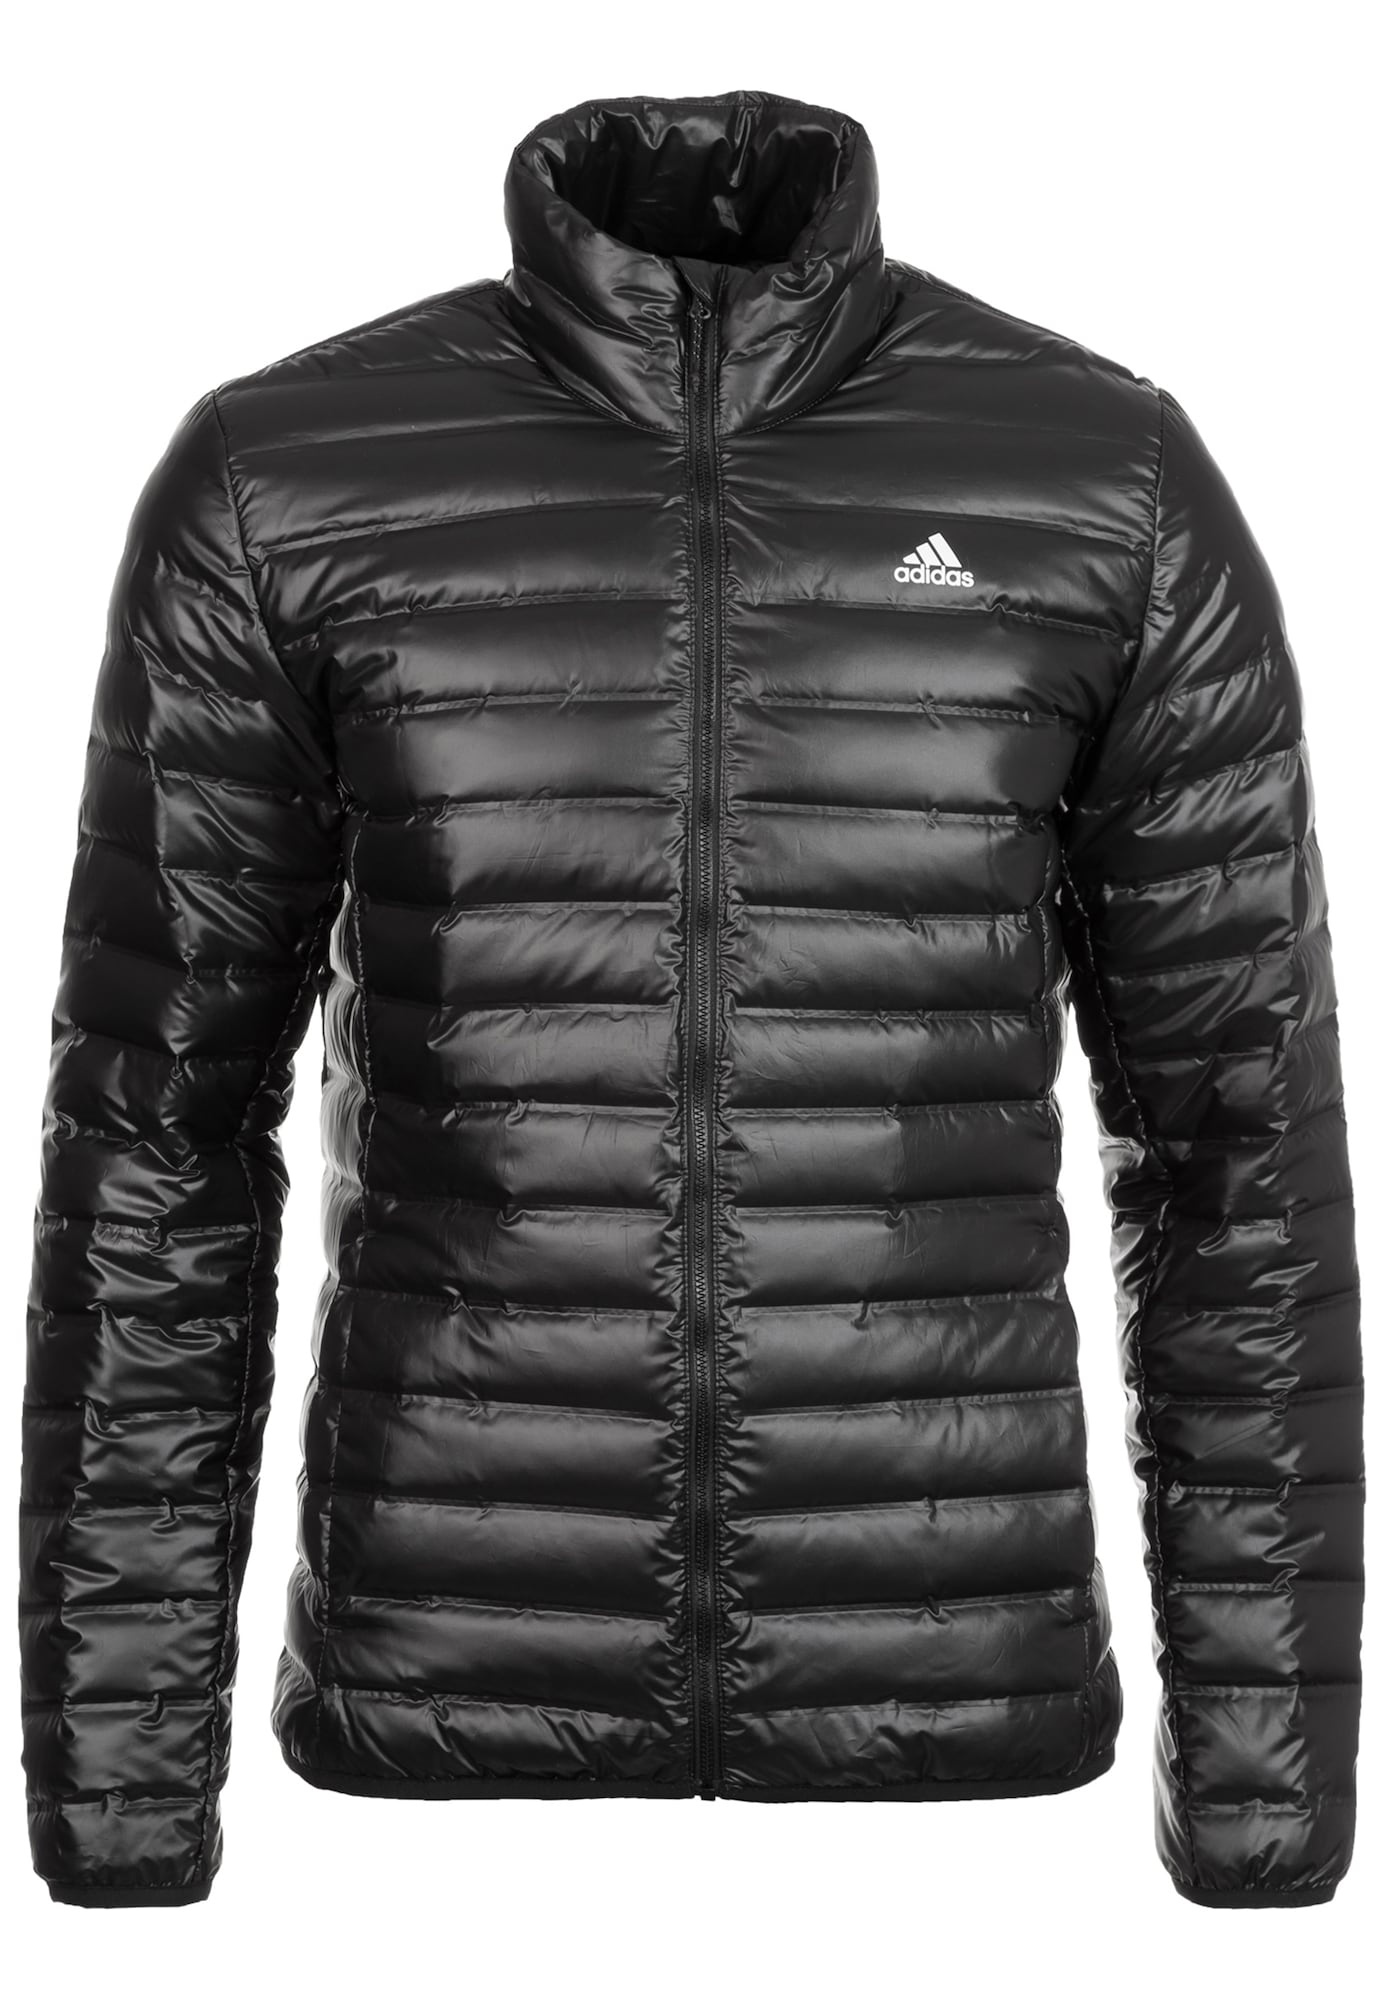 ADIDAS PERFORMANCE Sportovní bunda 'Varilite'  černá